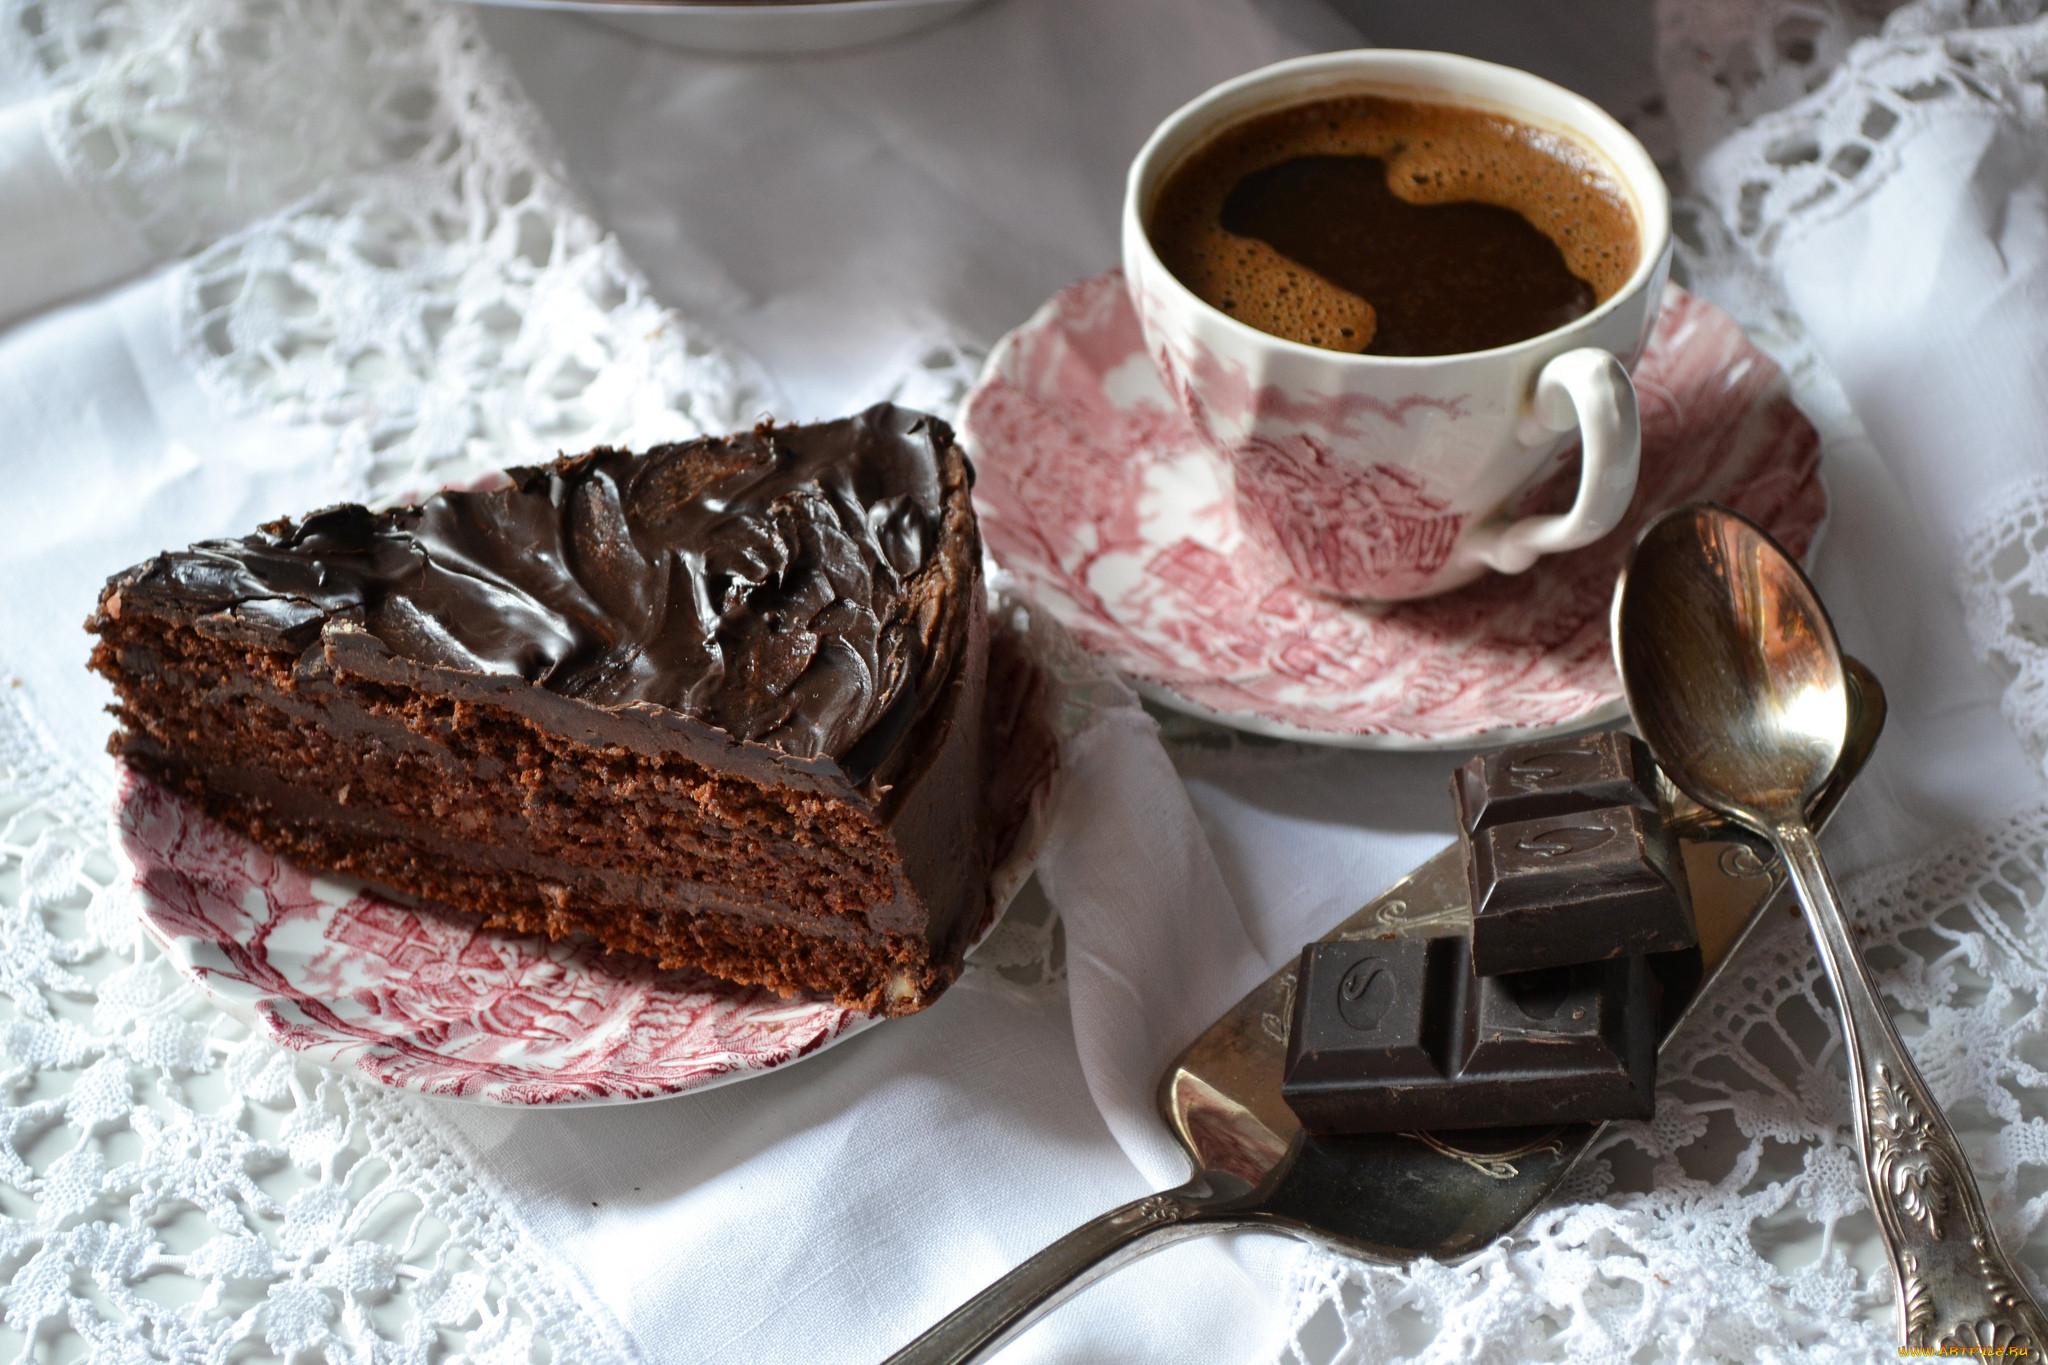 тогда картинки кофе и шоколад по французски красивые вишню противне